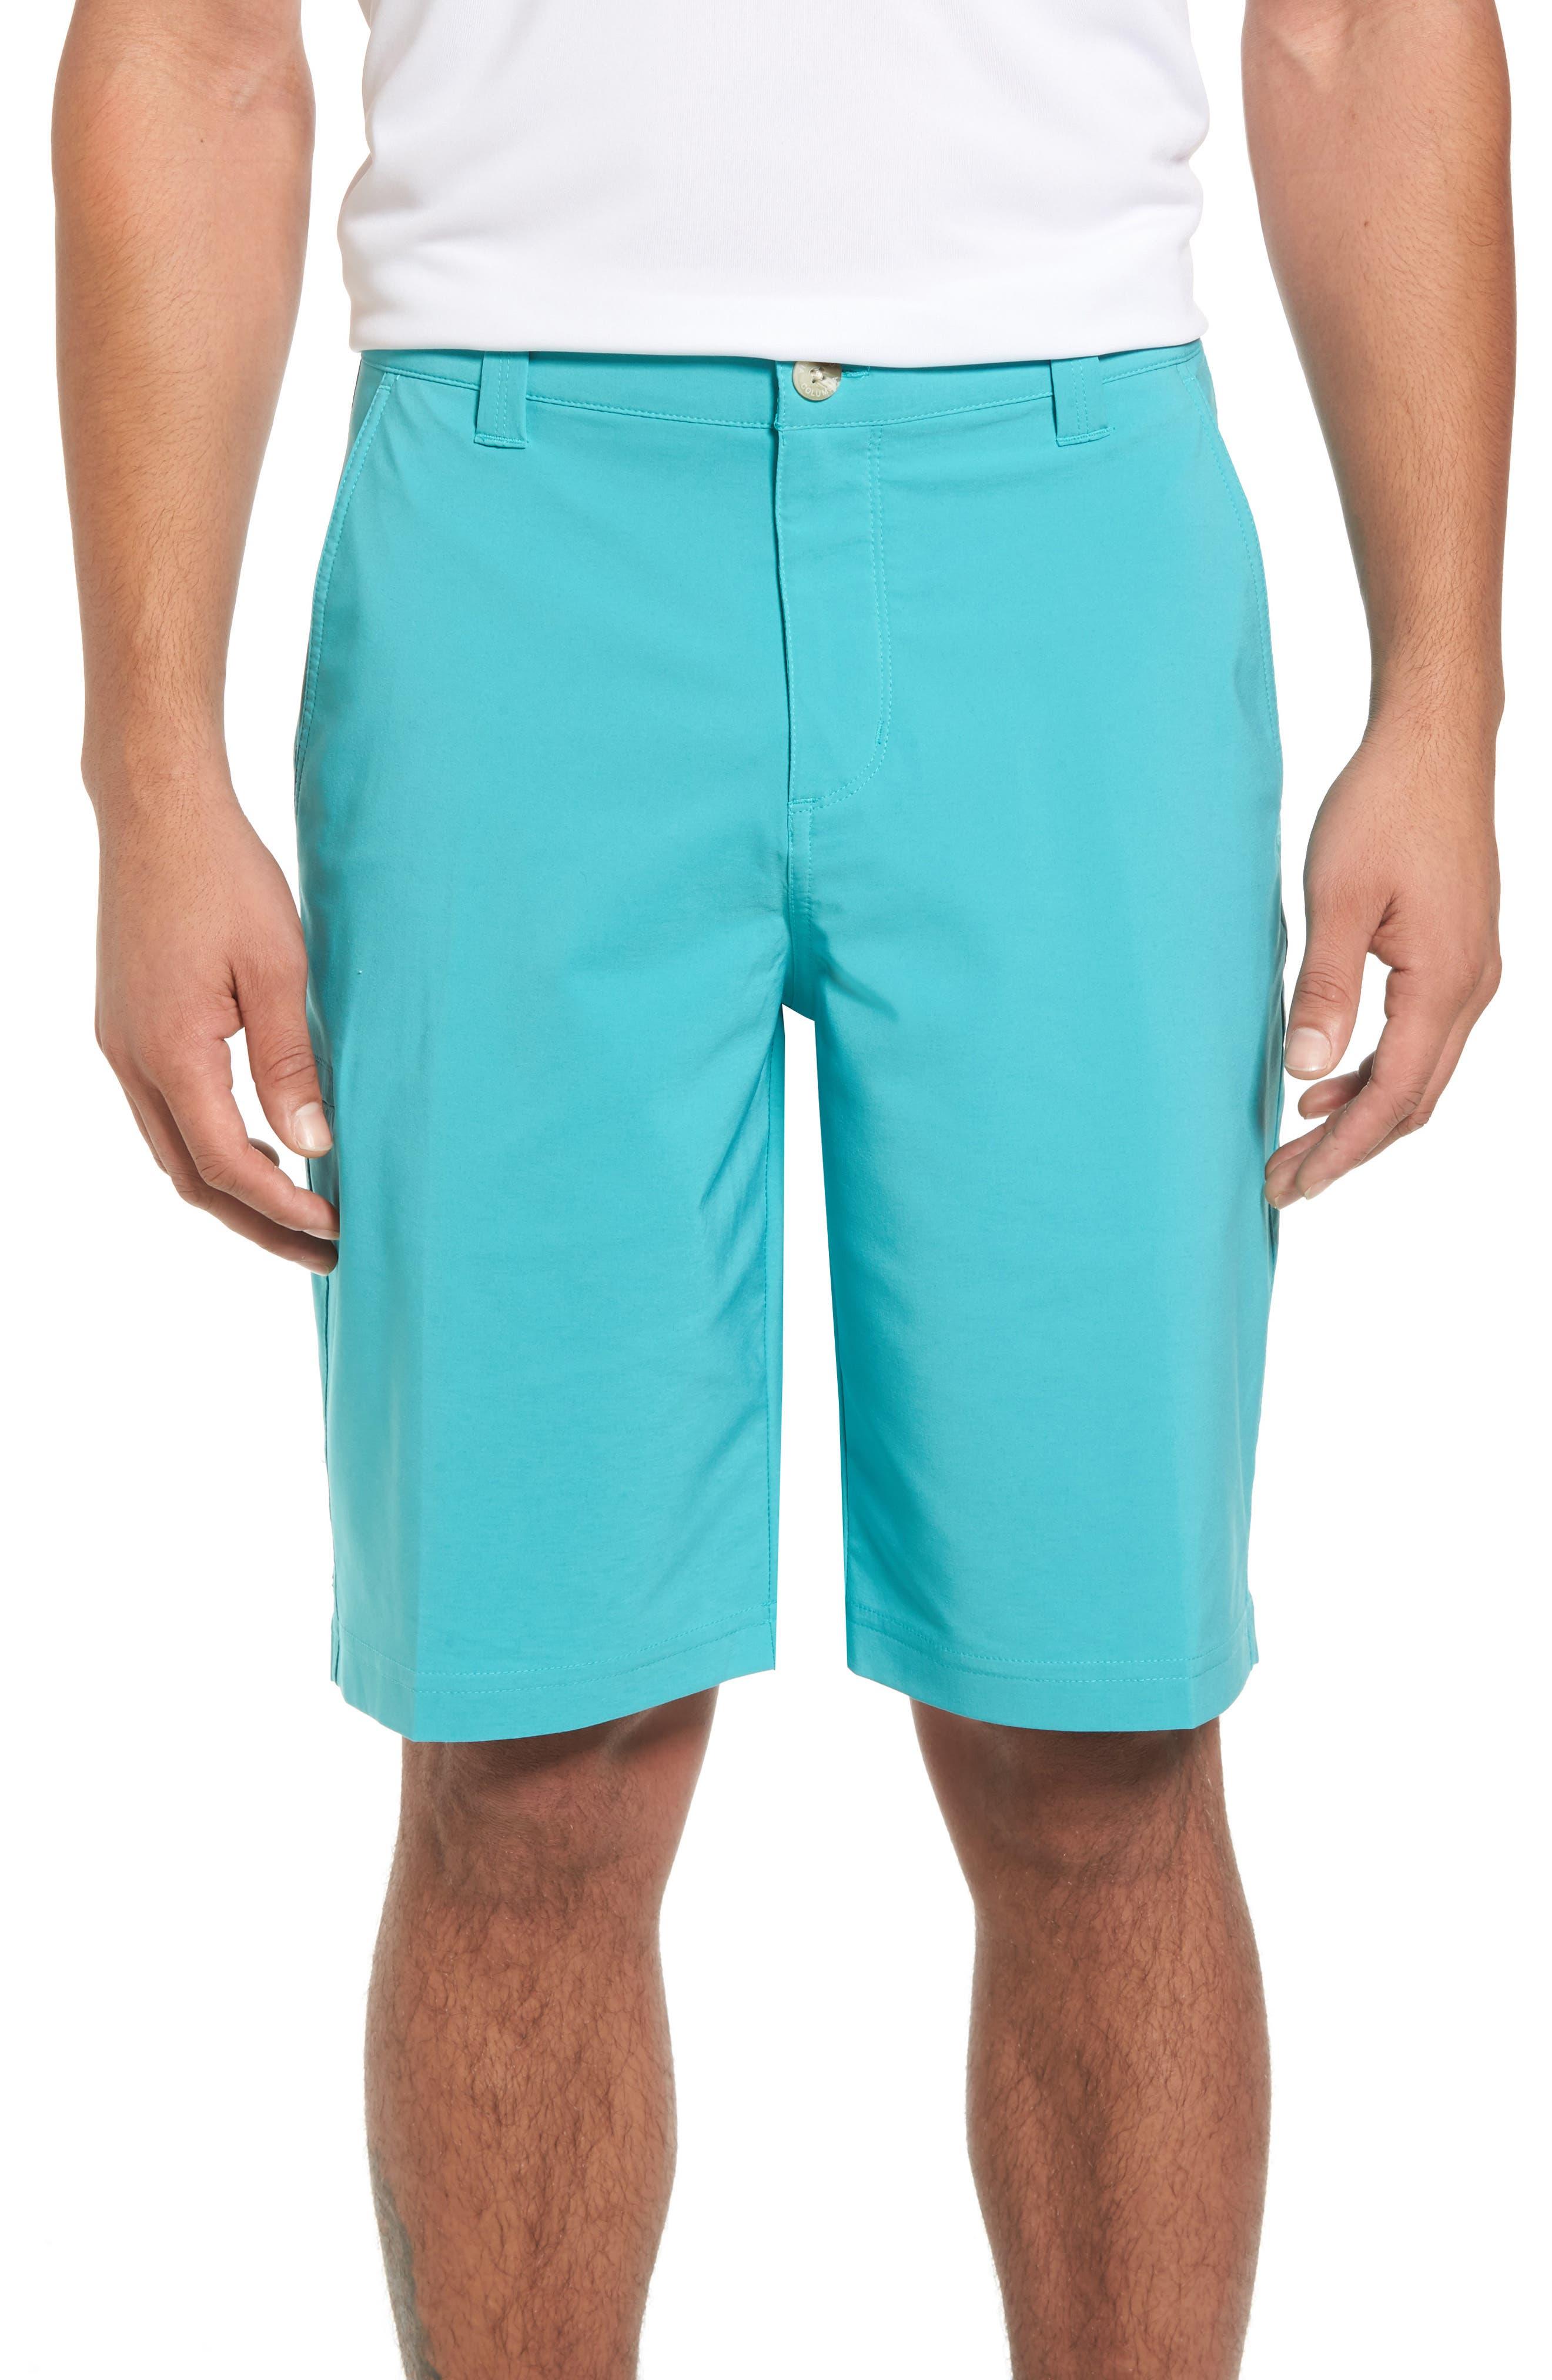 Main Image - Columbia PFG Grander Marlin II Shorts